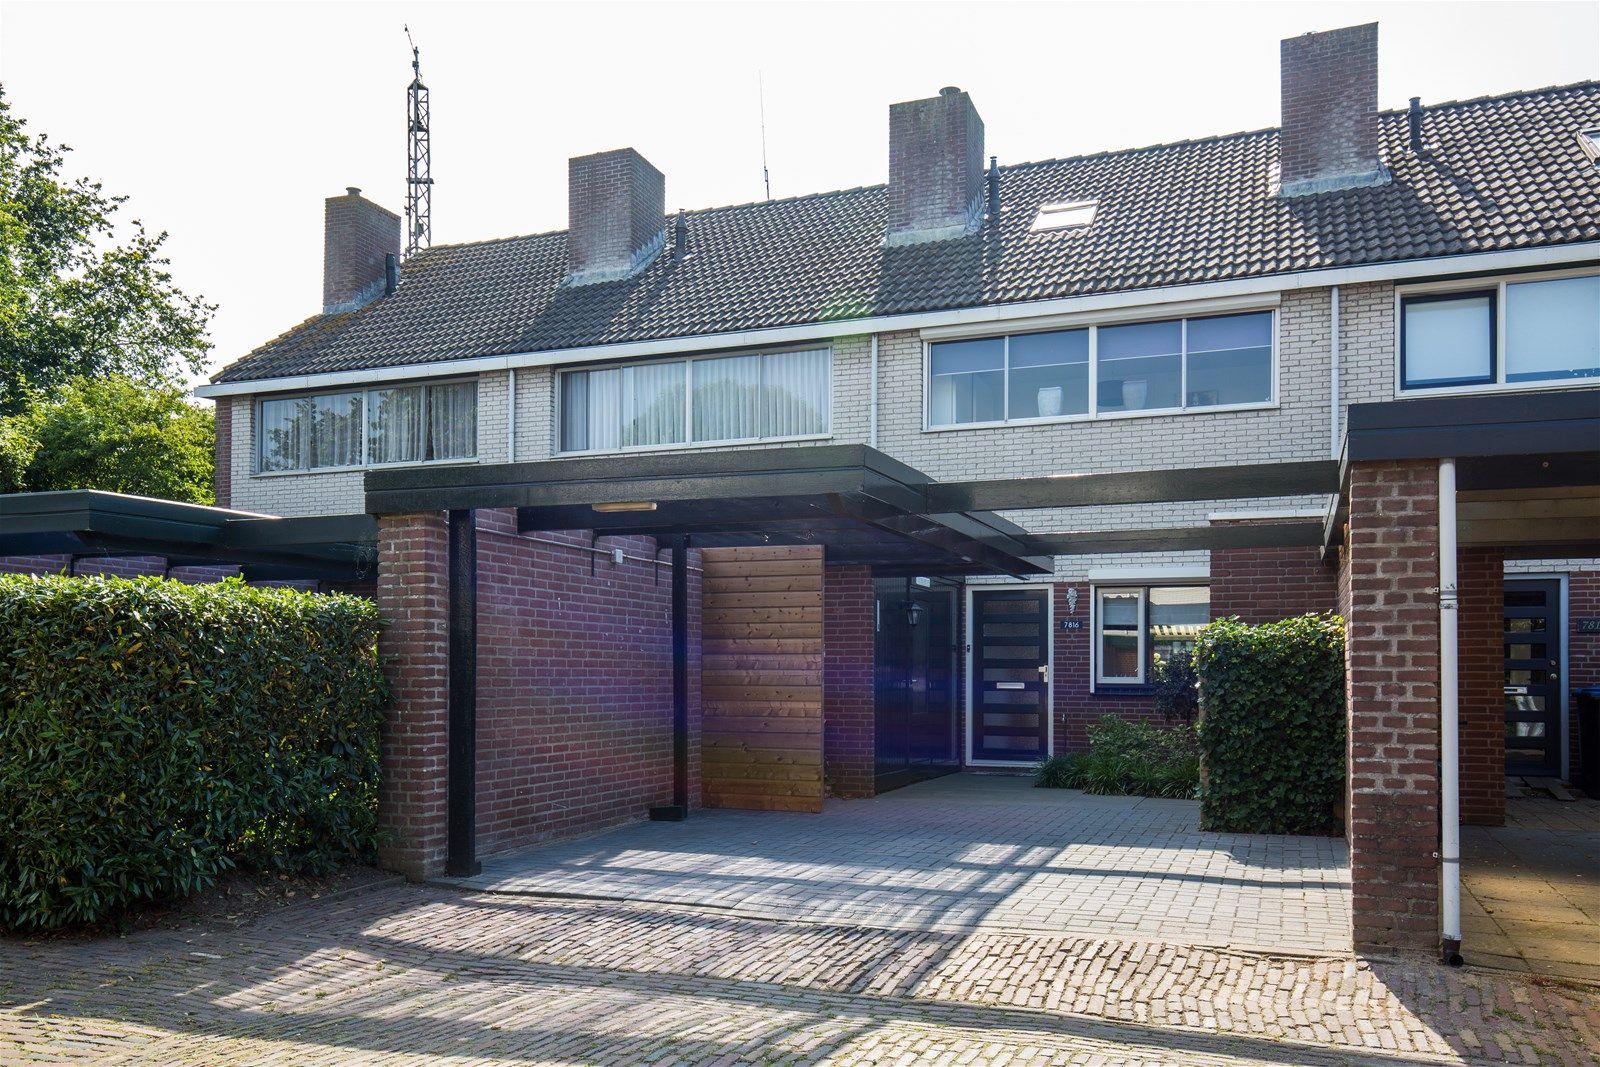 Kraaijenberg 7816, Wijchen